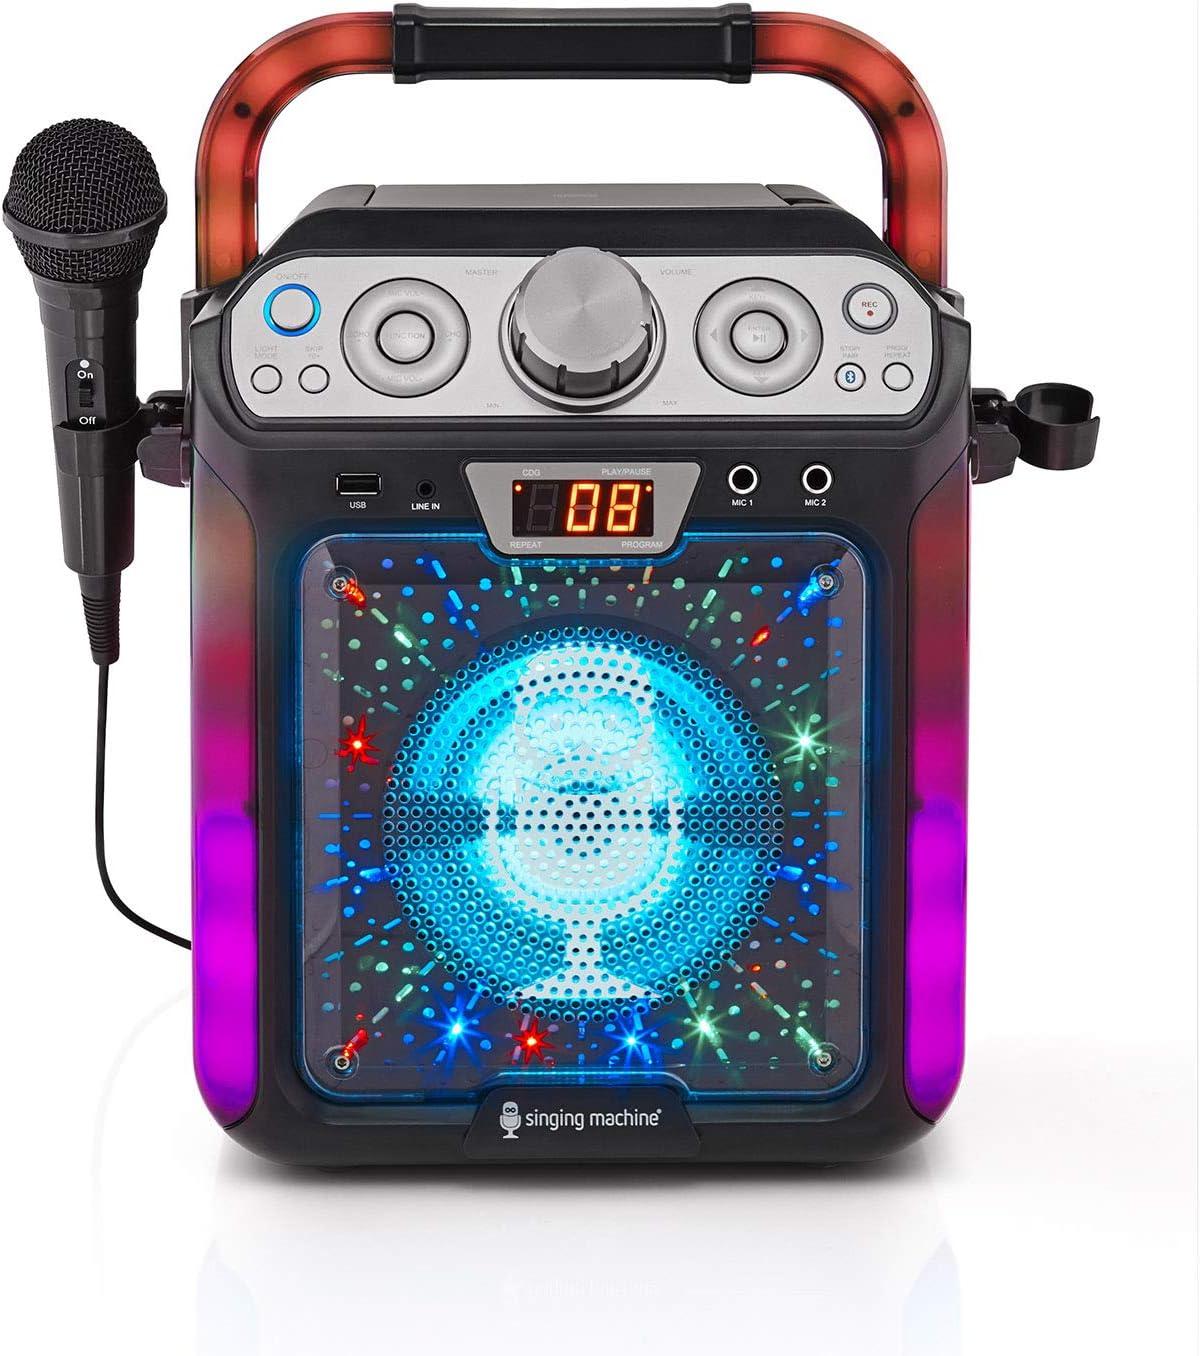 Singing Machine SML682BTBK Groove Cube CDG Karaoke System, Black